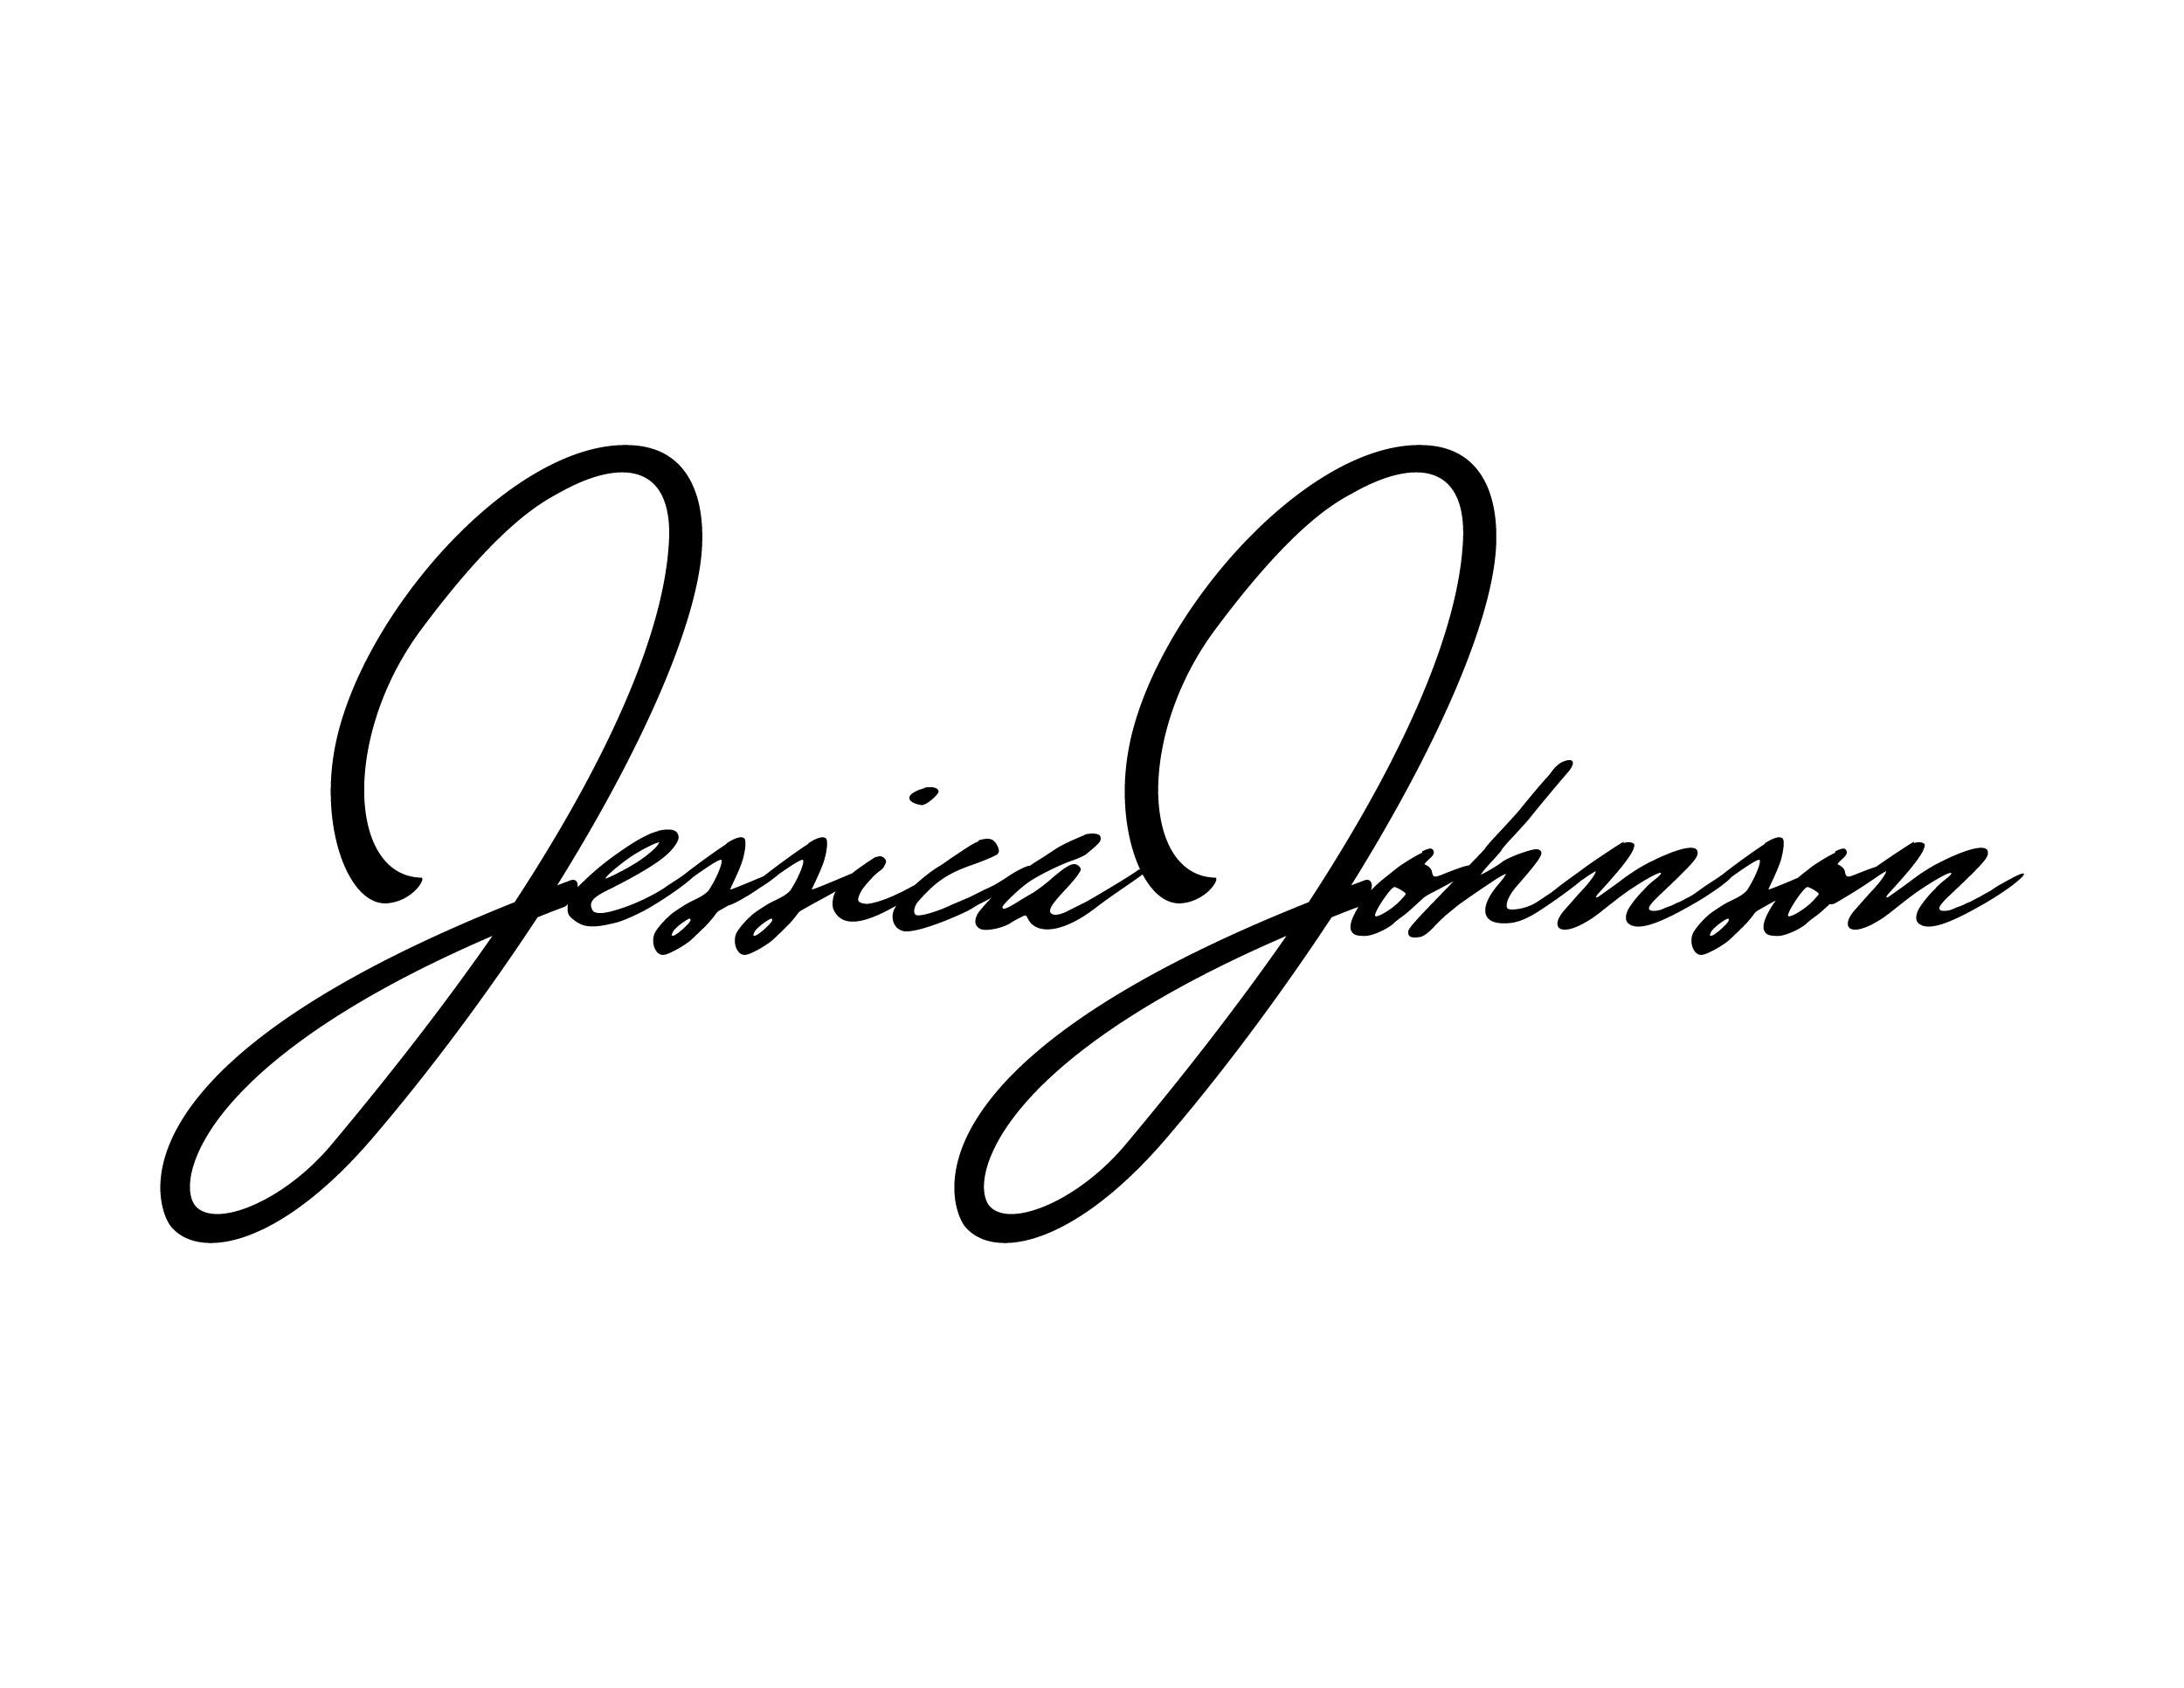 jessica_johnson_logo.png